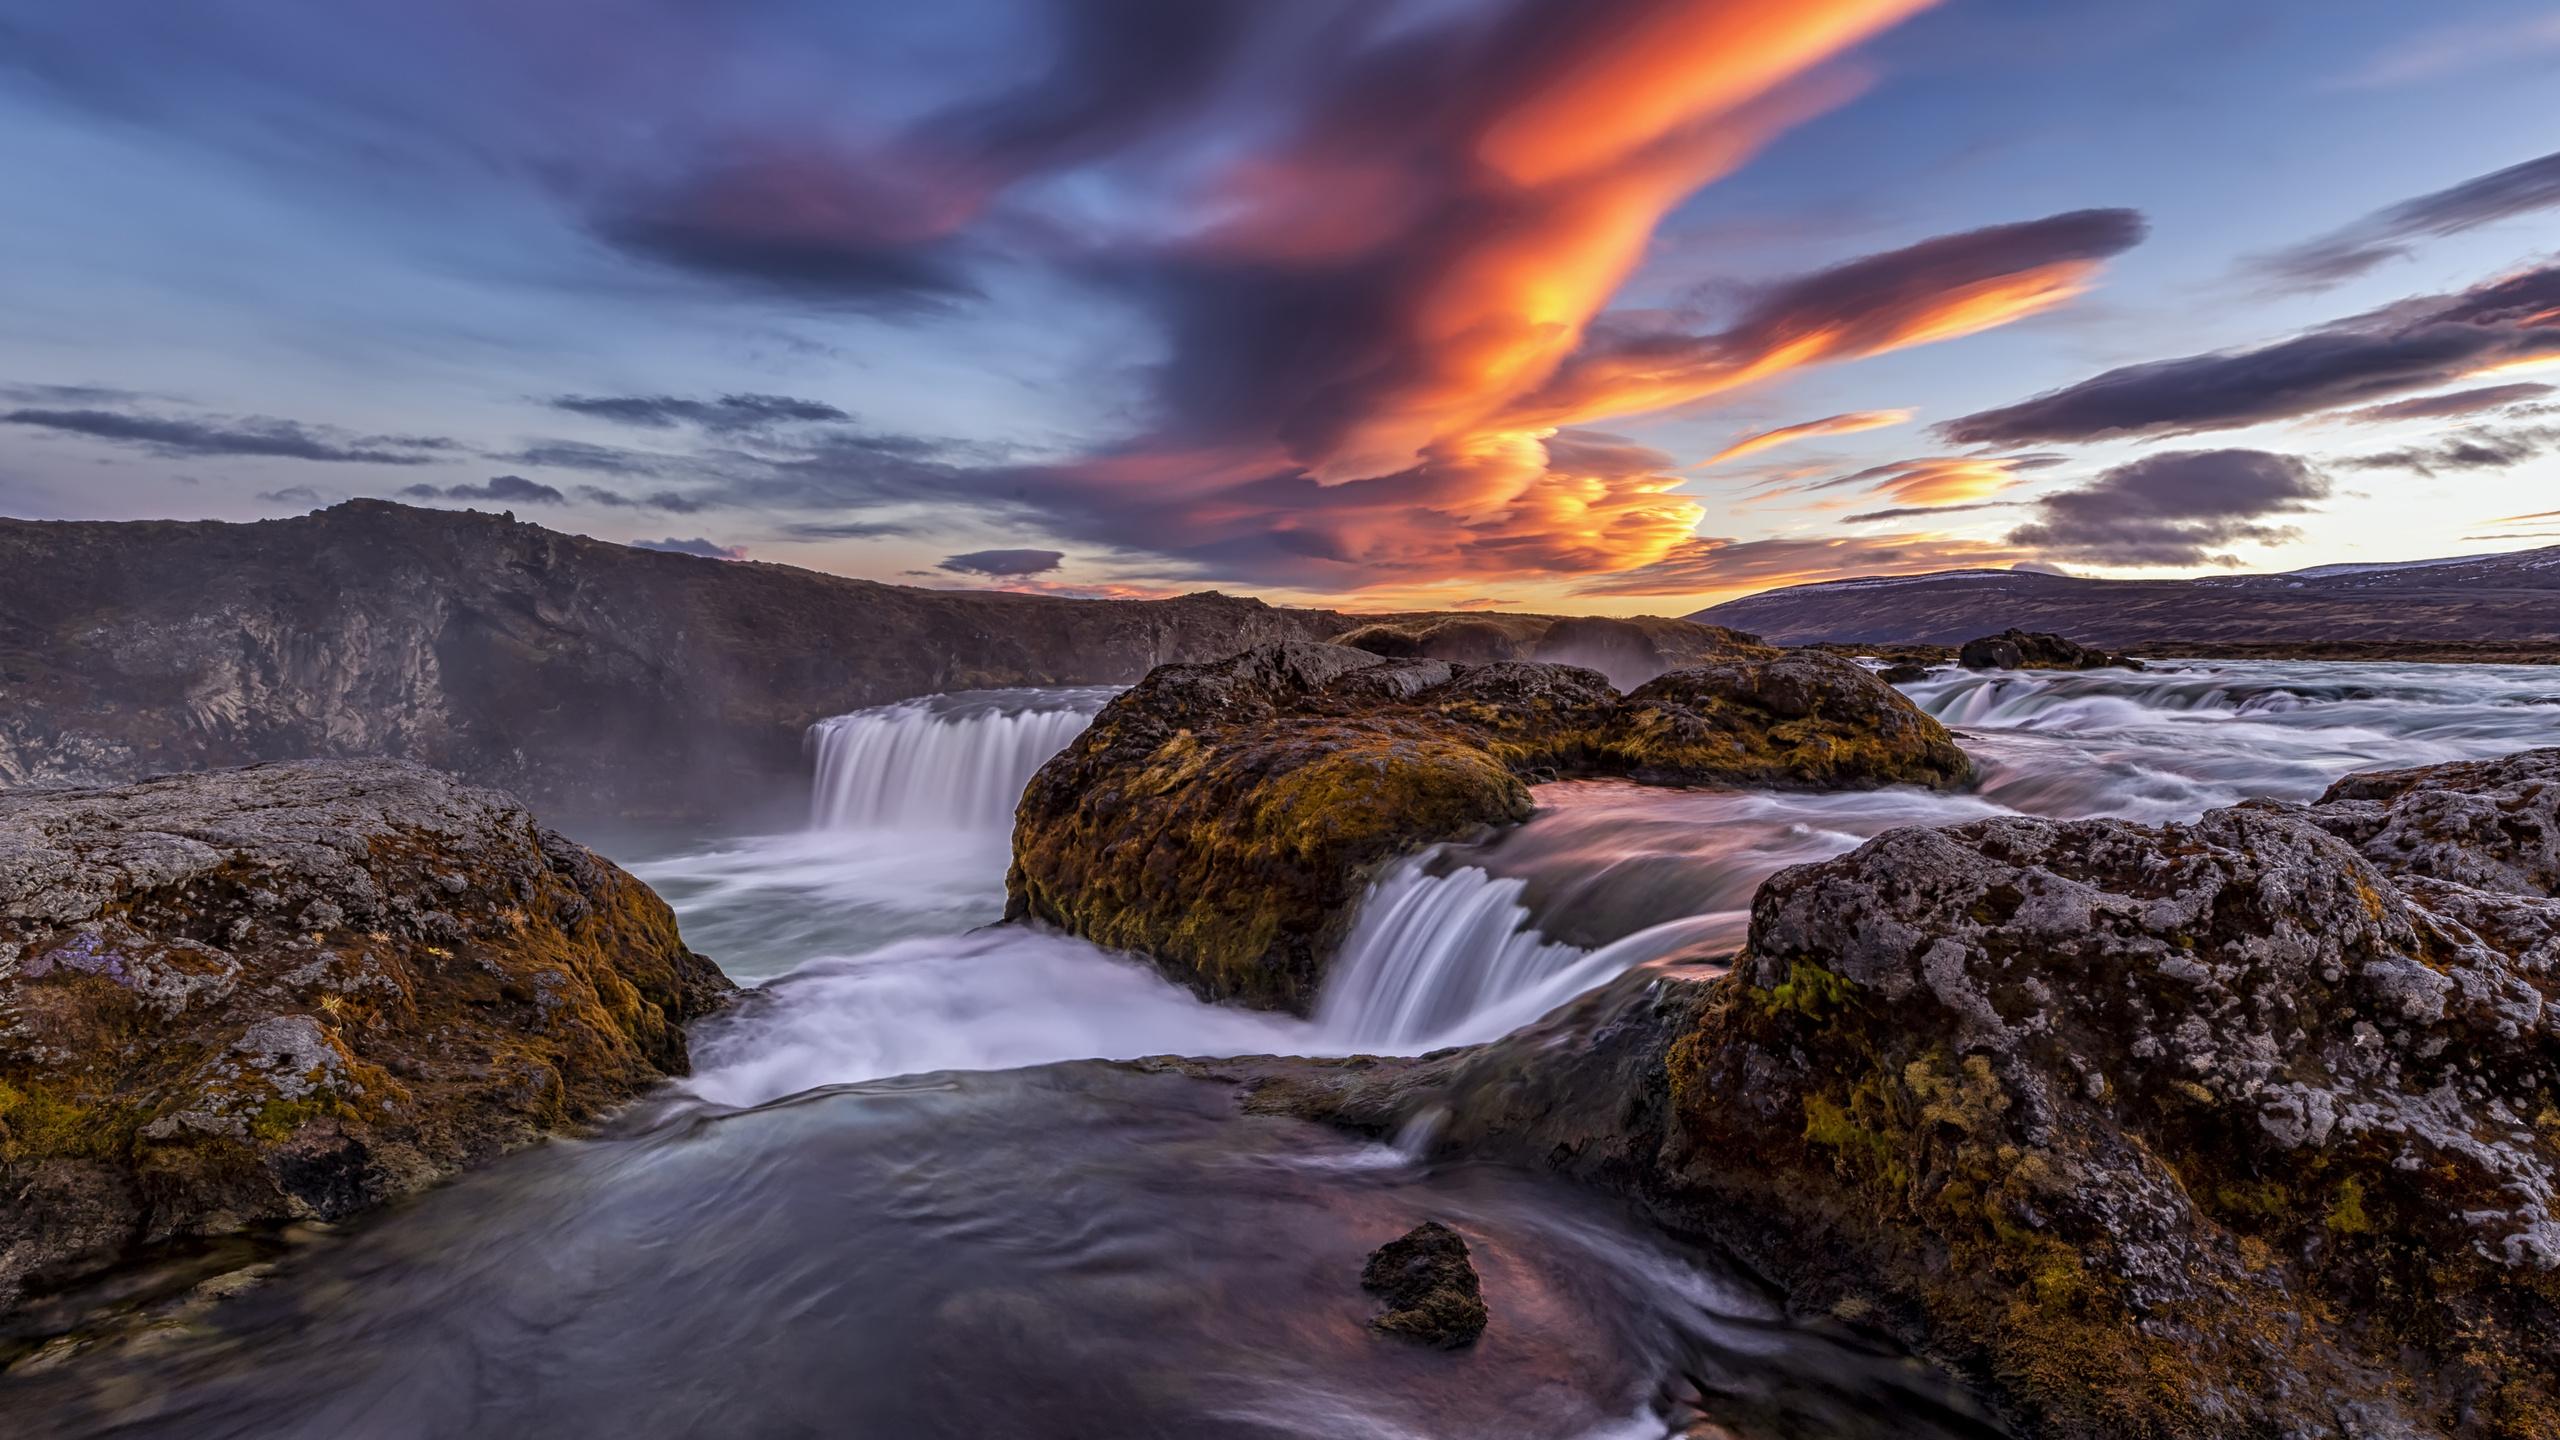 iceland-river-waterfall-4k-3p.jpg